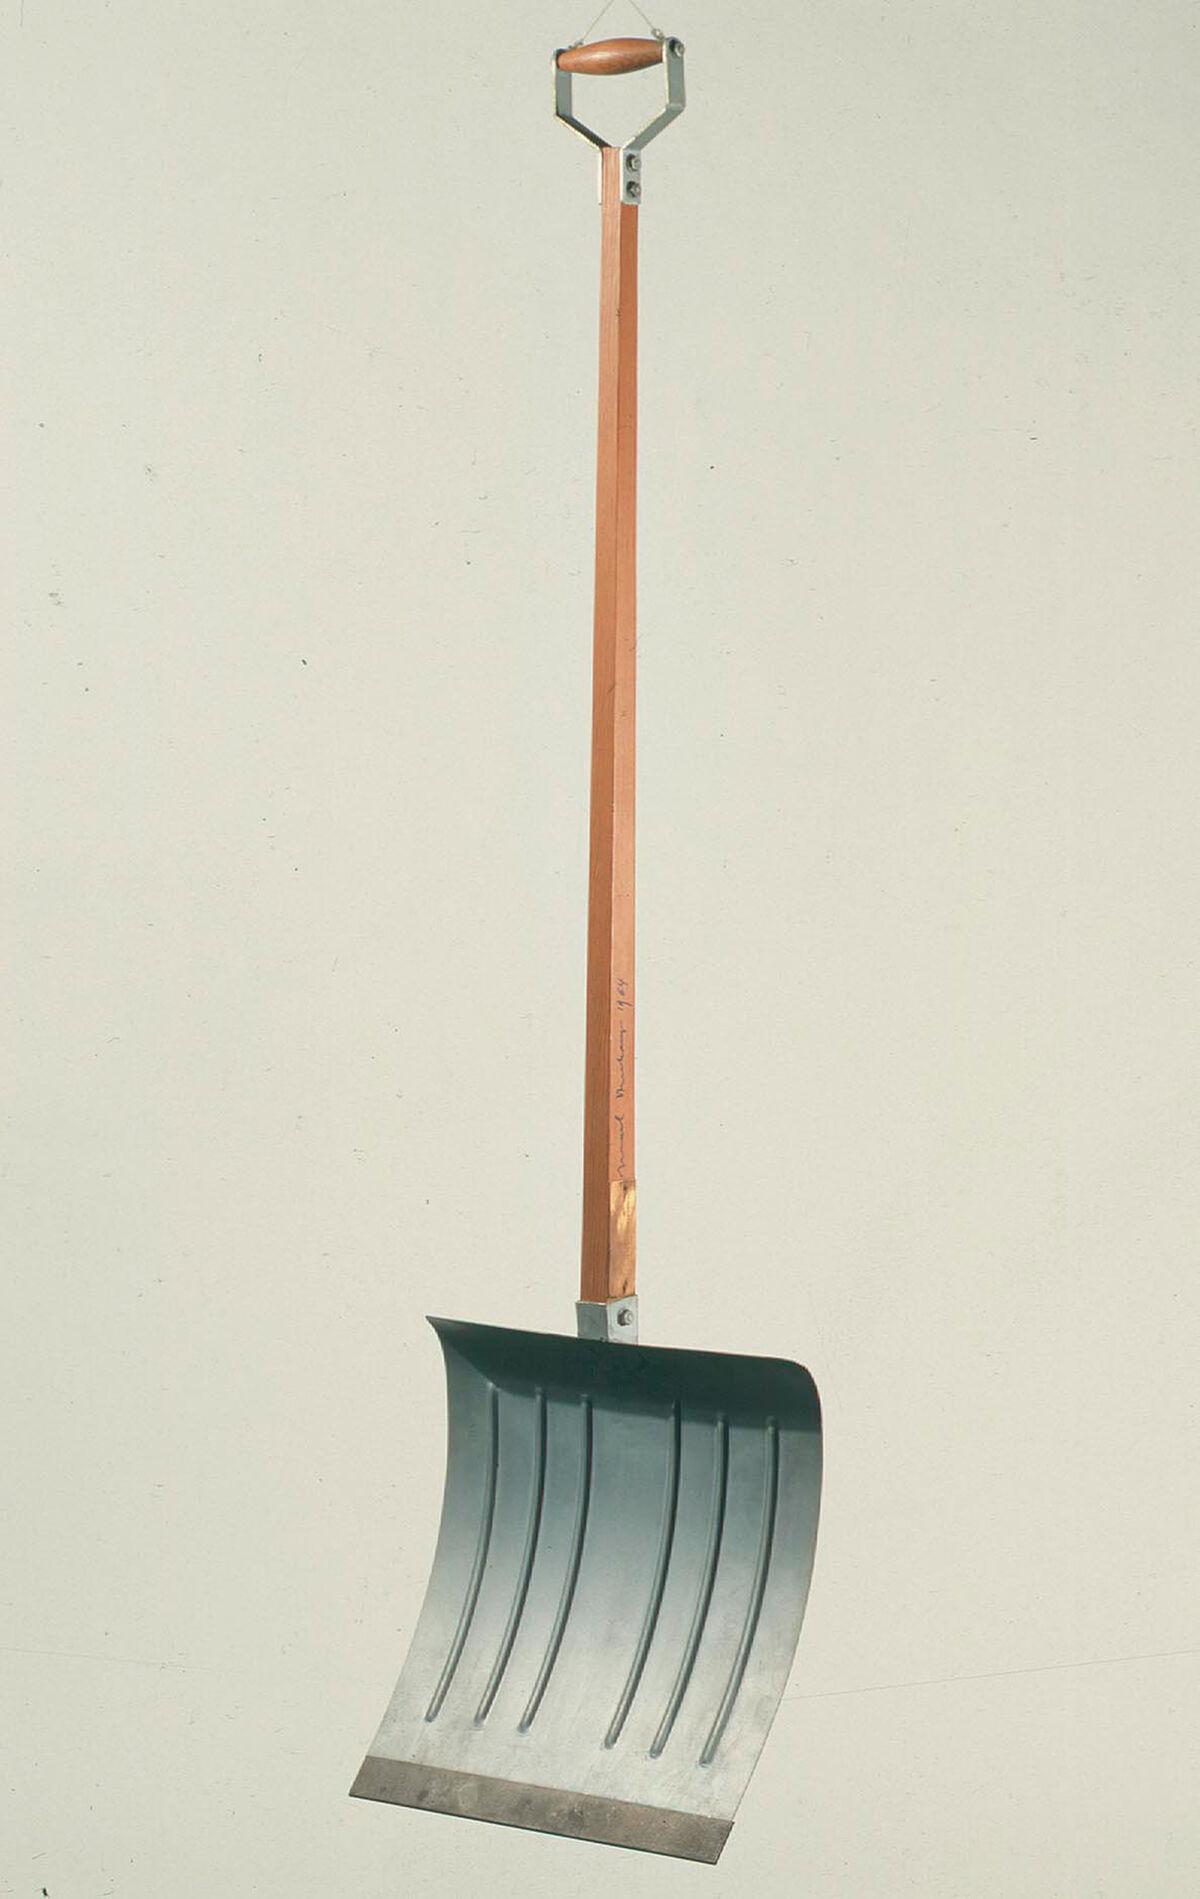 Marcel Duchamp, In Advance of the Broken Arm, 1915. © Marcel Duchamp/ADAG /SOMAAP/México/2019. Courtesy of Galleria Nazionale d'Arte Moderna e Contemporanea, Rome and Museo Jumex.